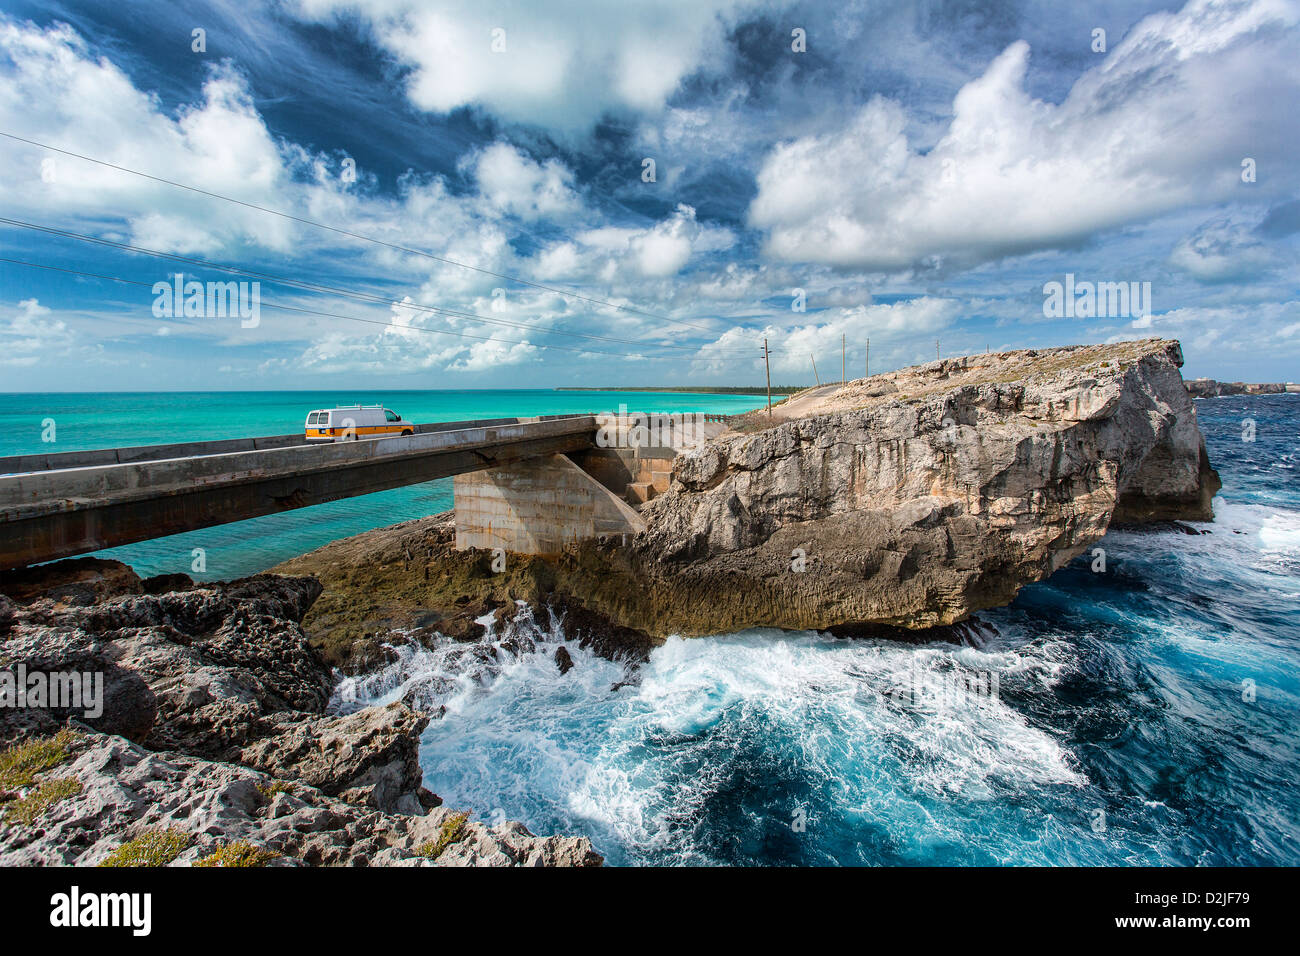 Bahamas, Eleuthera Insel, die Glas-Fenster-Brücke Stockbild